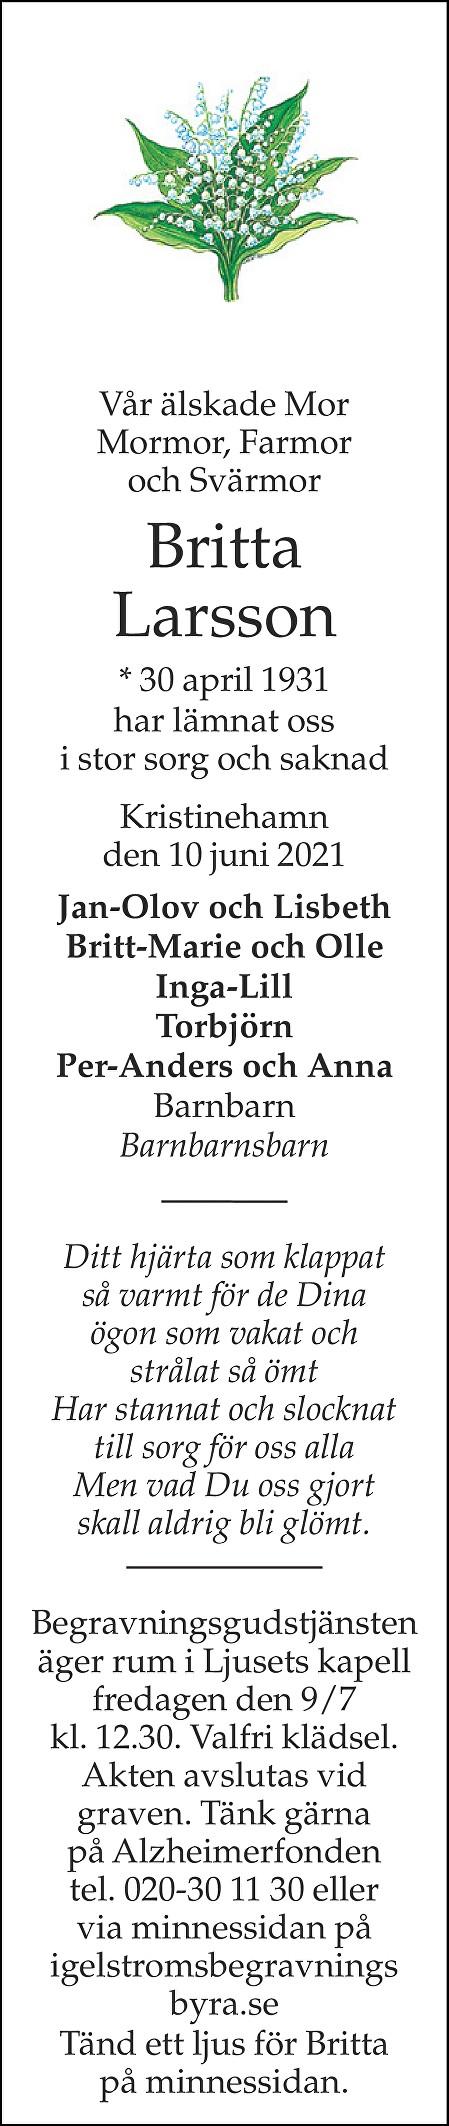 Britta Larsson Death notice